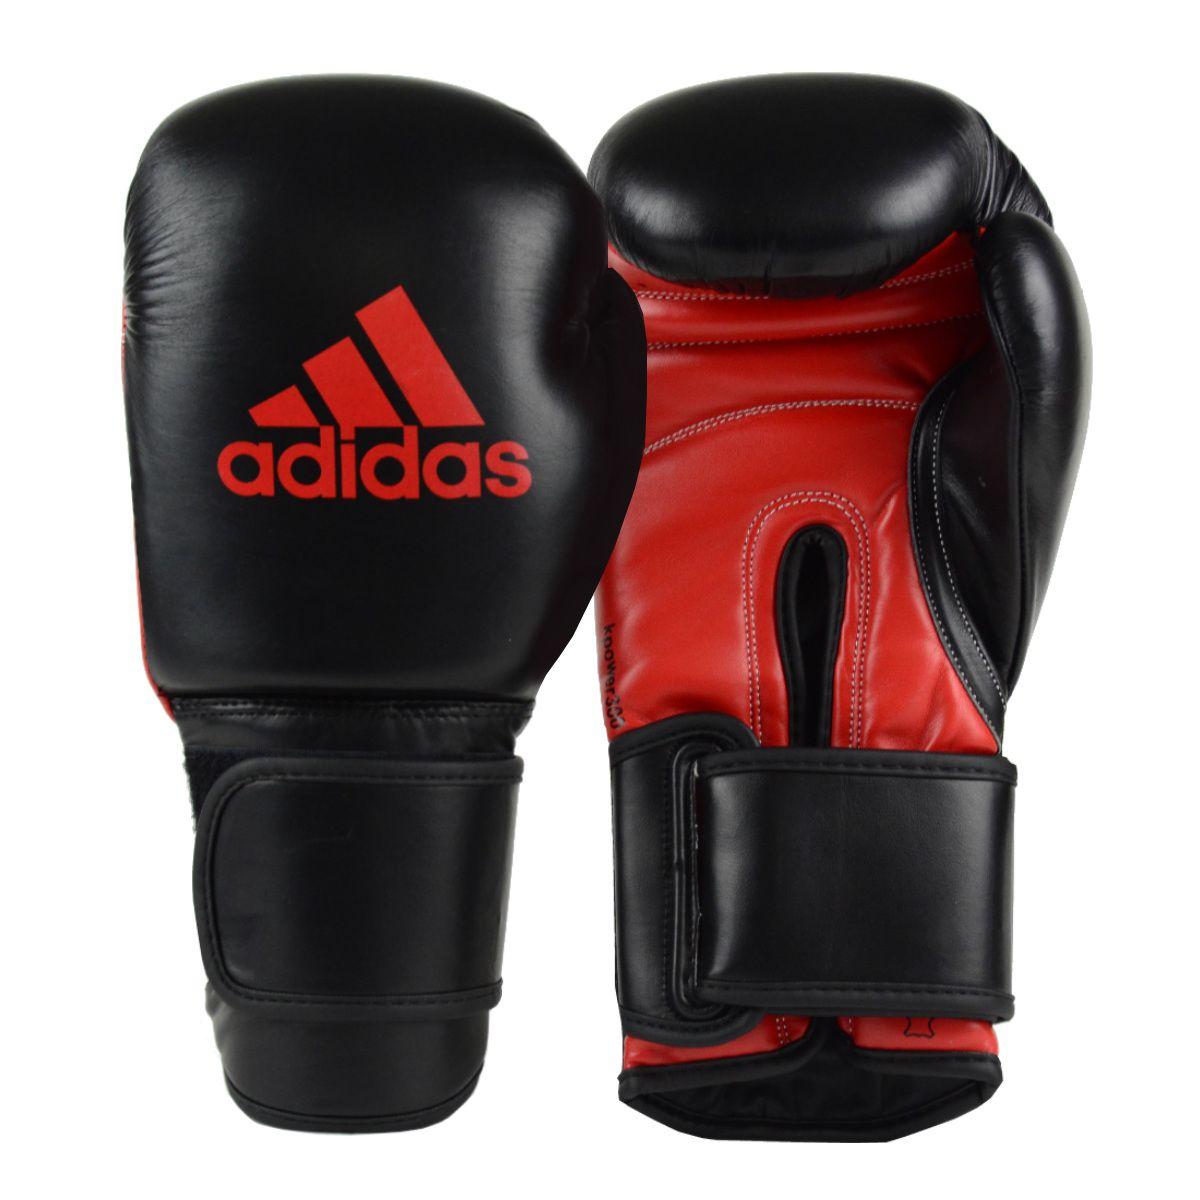 Luva de Kickboxing adidas KPower 300 - Preta/Vermelha